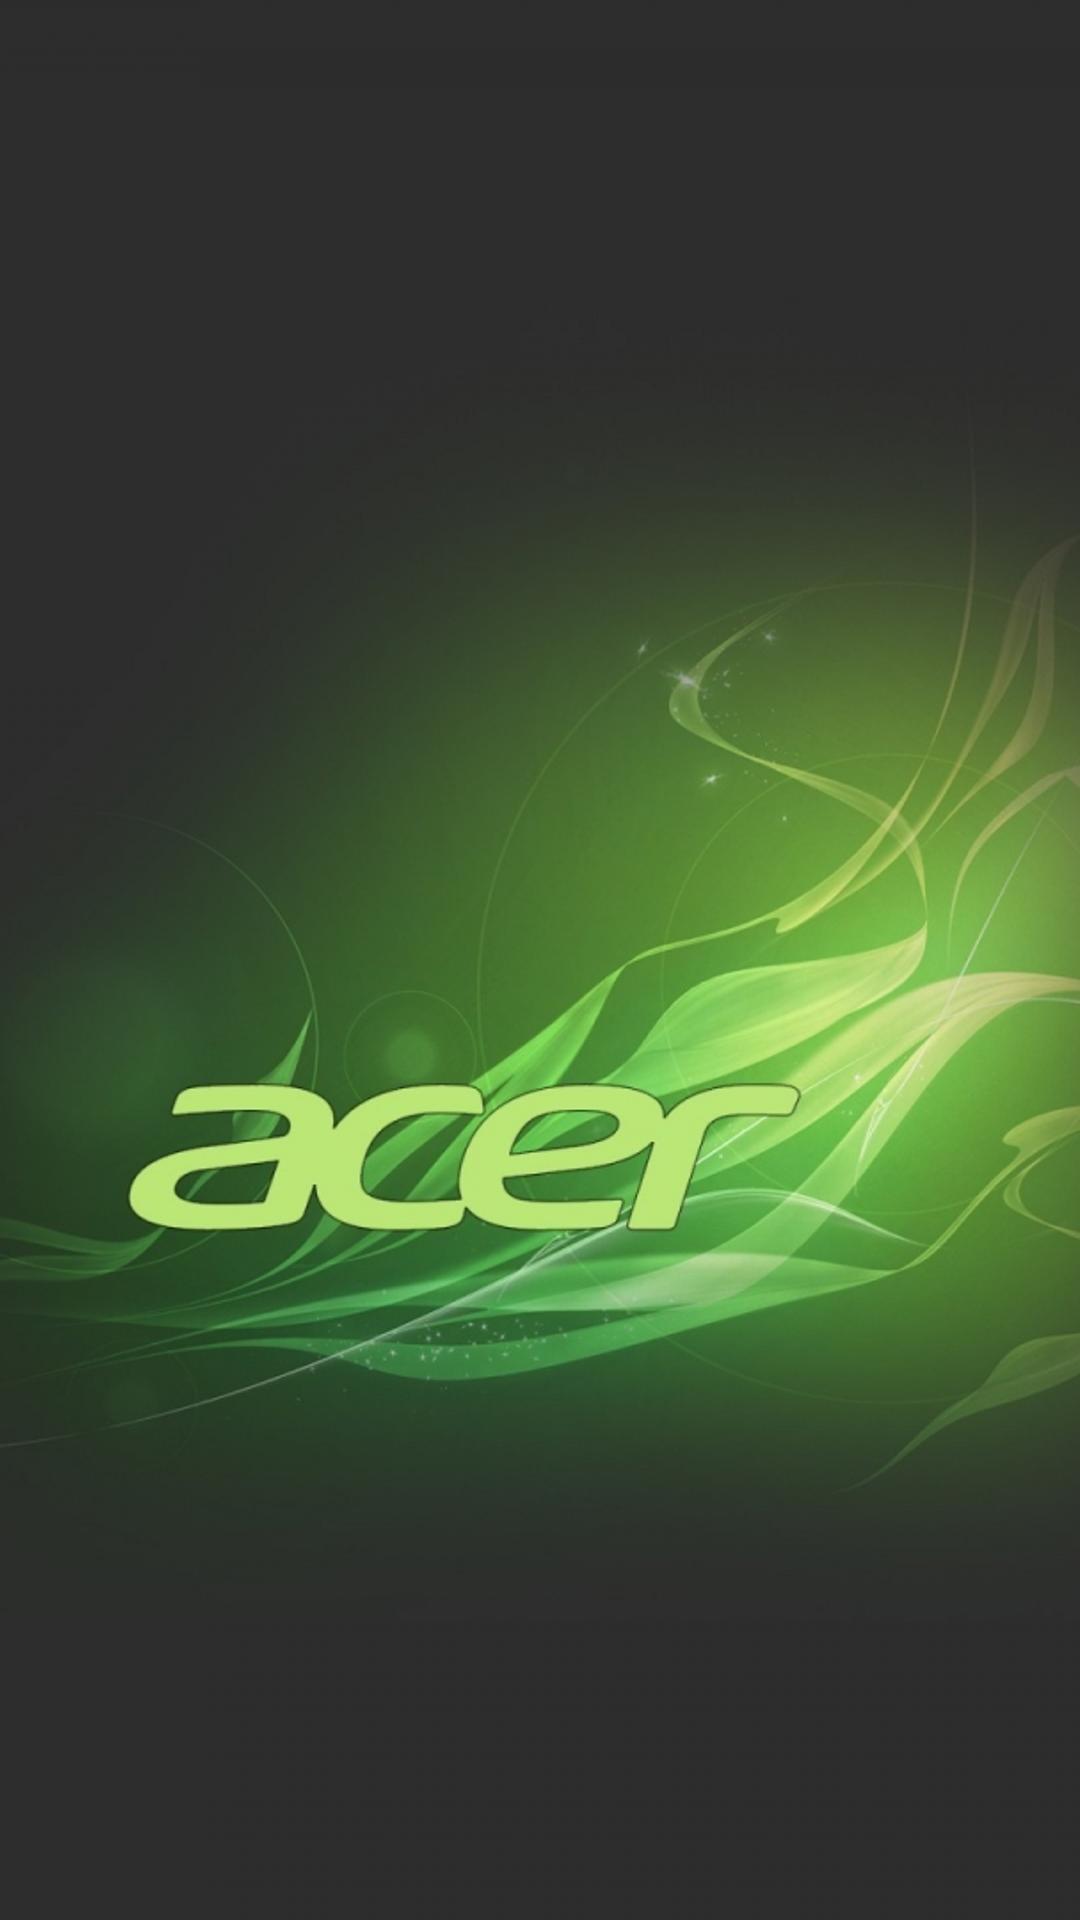 Valentines Day 3d Wallpaper Green And Black Acer Logo Wallpaper Wallpaper Download